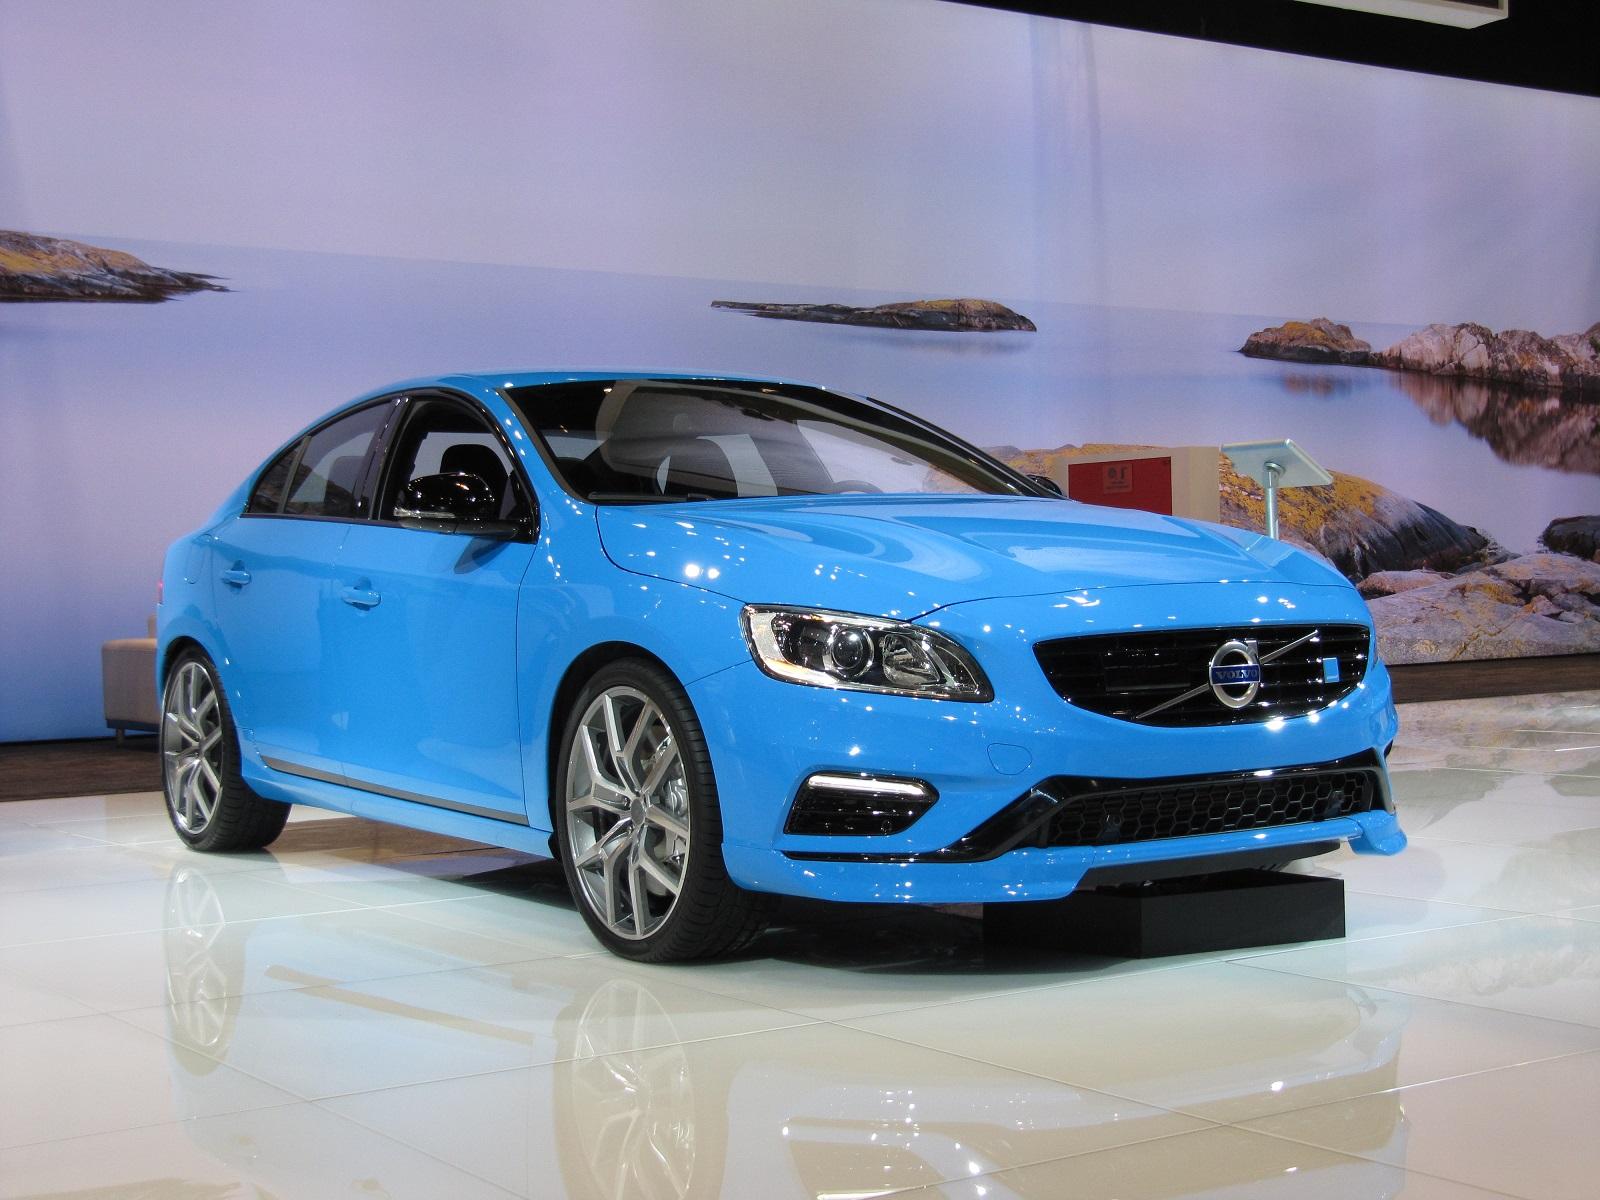 Volvo V60 Spy Shots >> 2015 Volvo S60 And V60 Polestar Debut At 2014 Chicago Auto Show: Live Photos